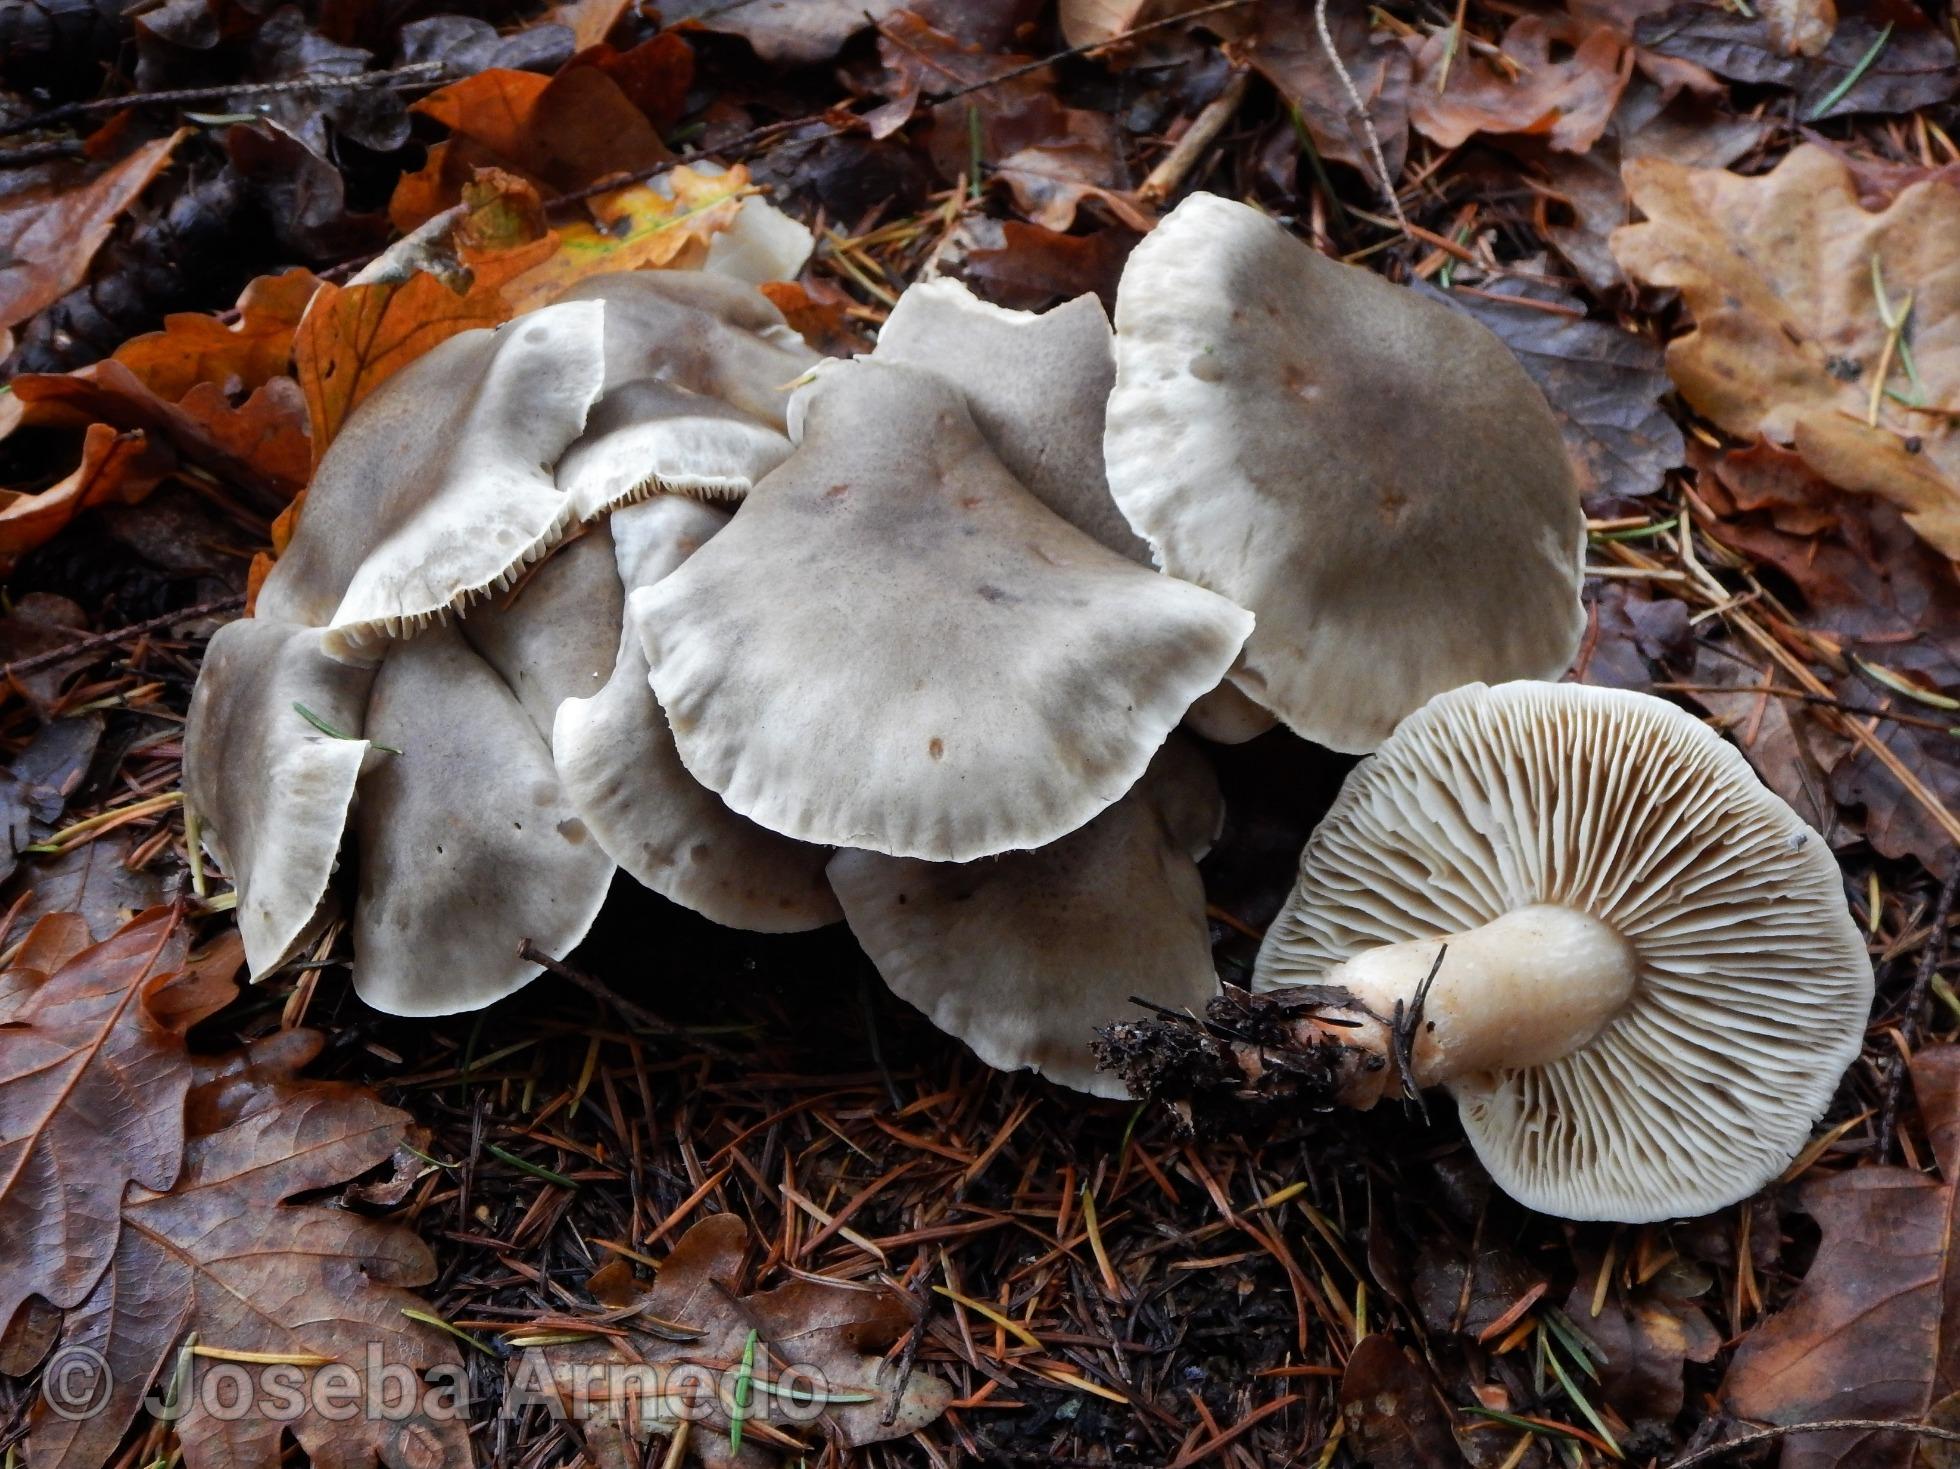 Tricholomasaponaceum_1545157610439.jpg